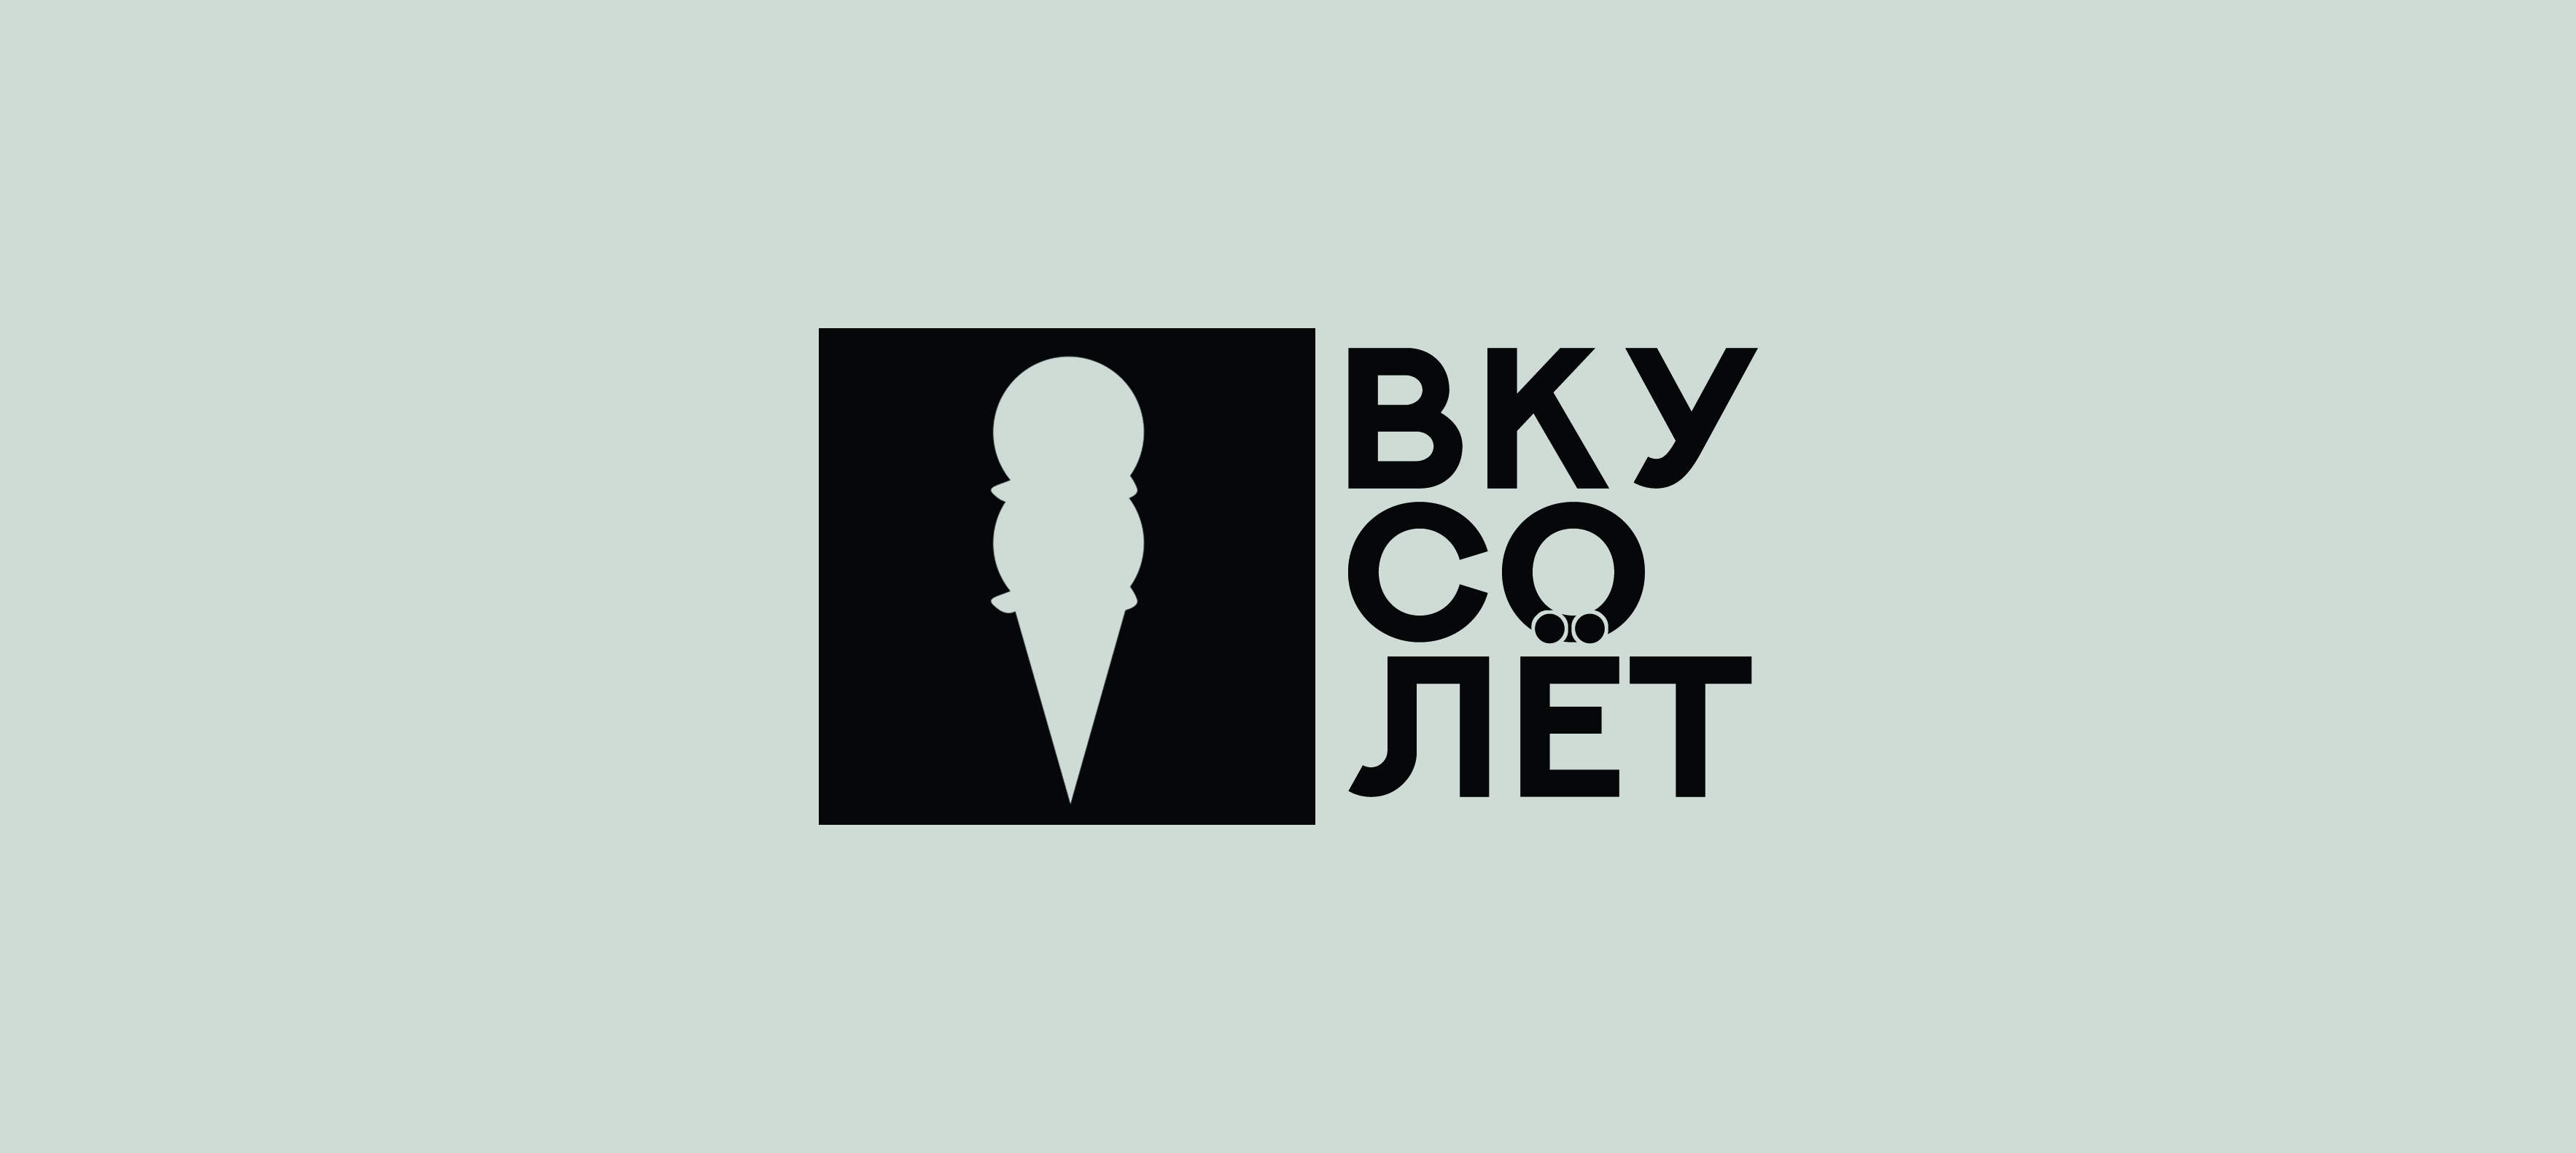 Логотип для доставки еды фото f_88859d3dcac77966.jpg